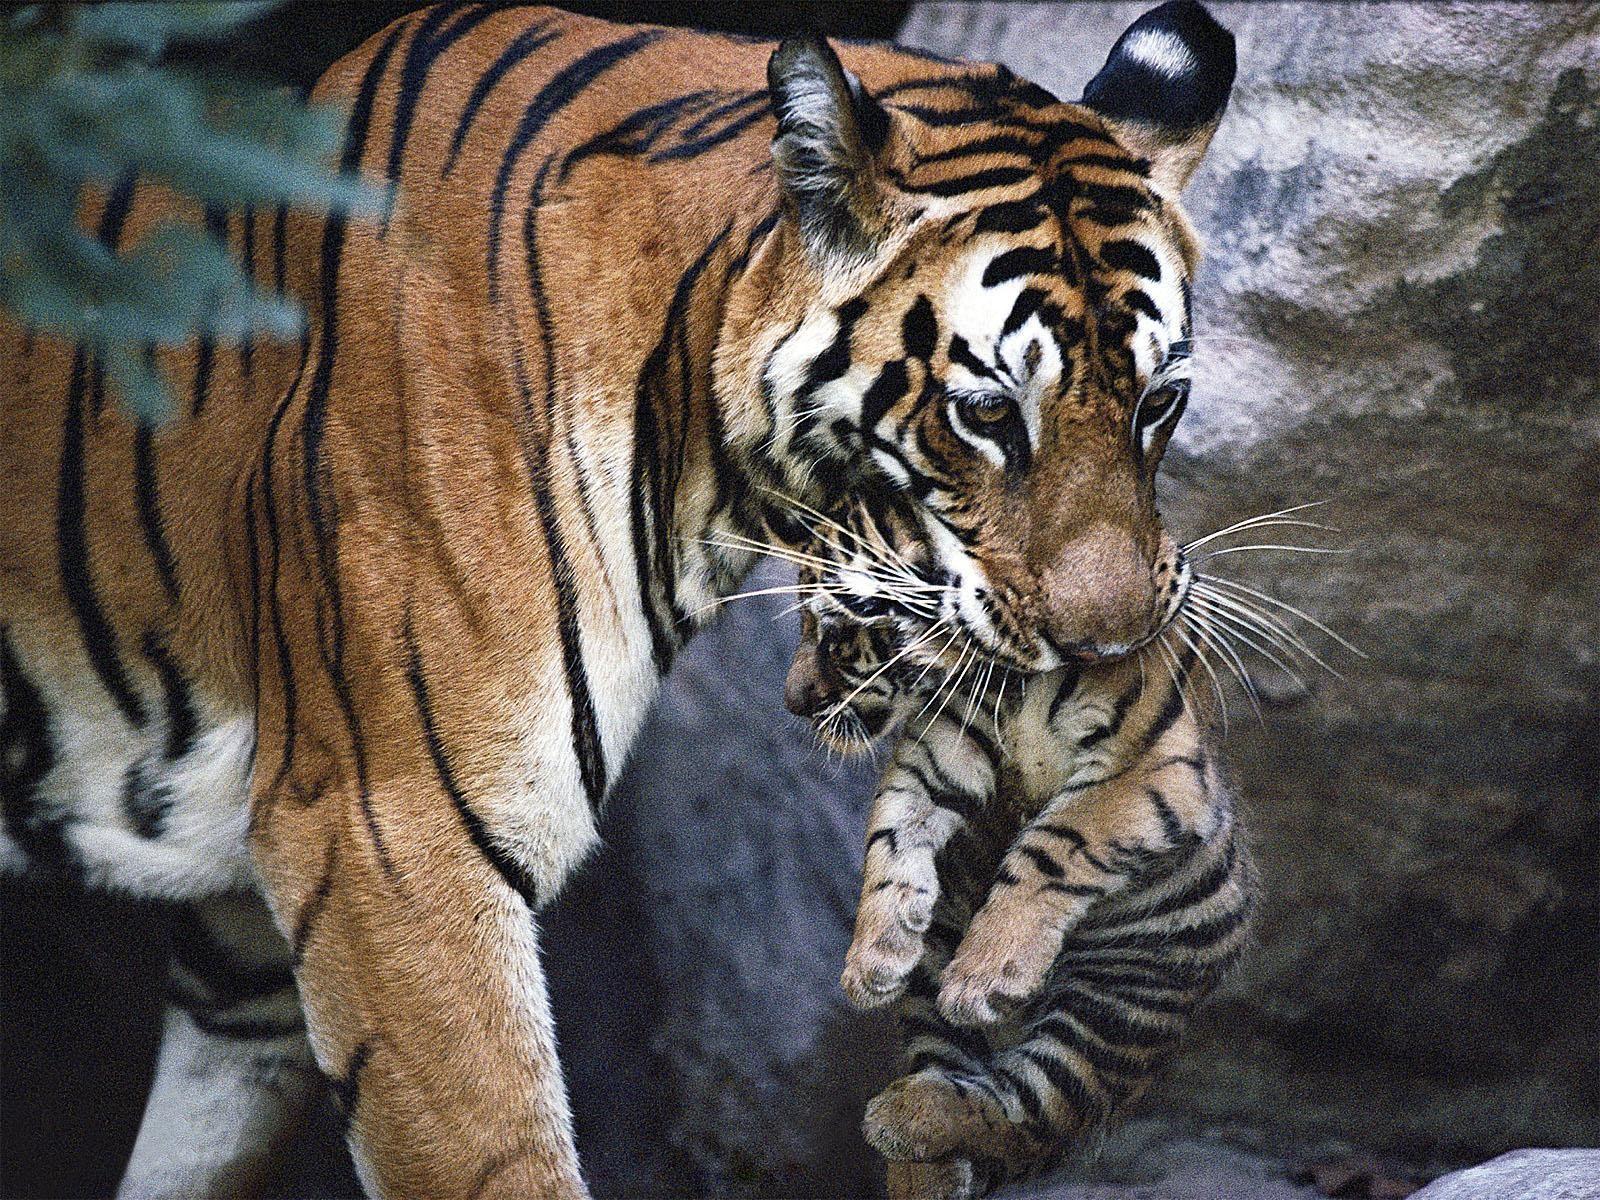 A tigresa do whatsapp atacando o cabaccedilo flakael esfrega a buceta na cara dele e ele rejeita - 3 2